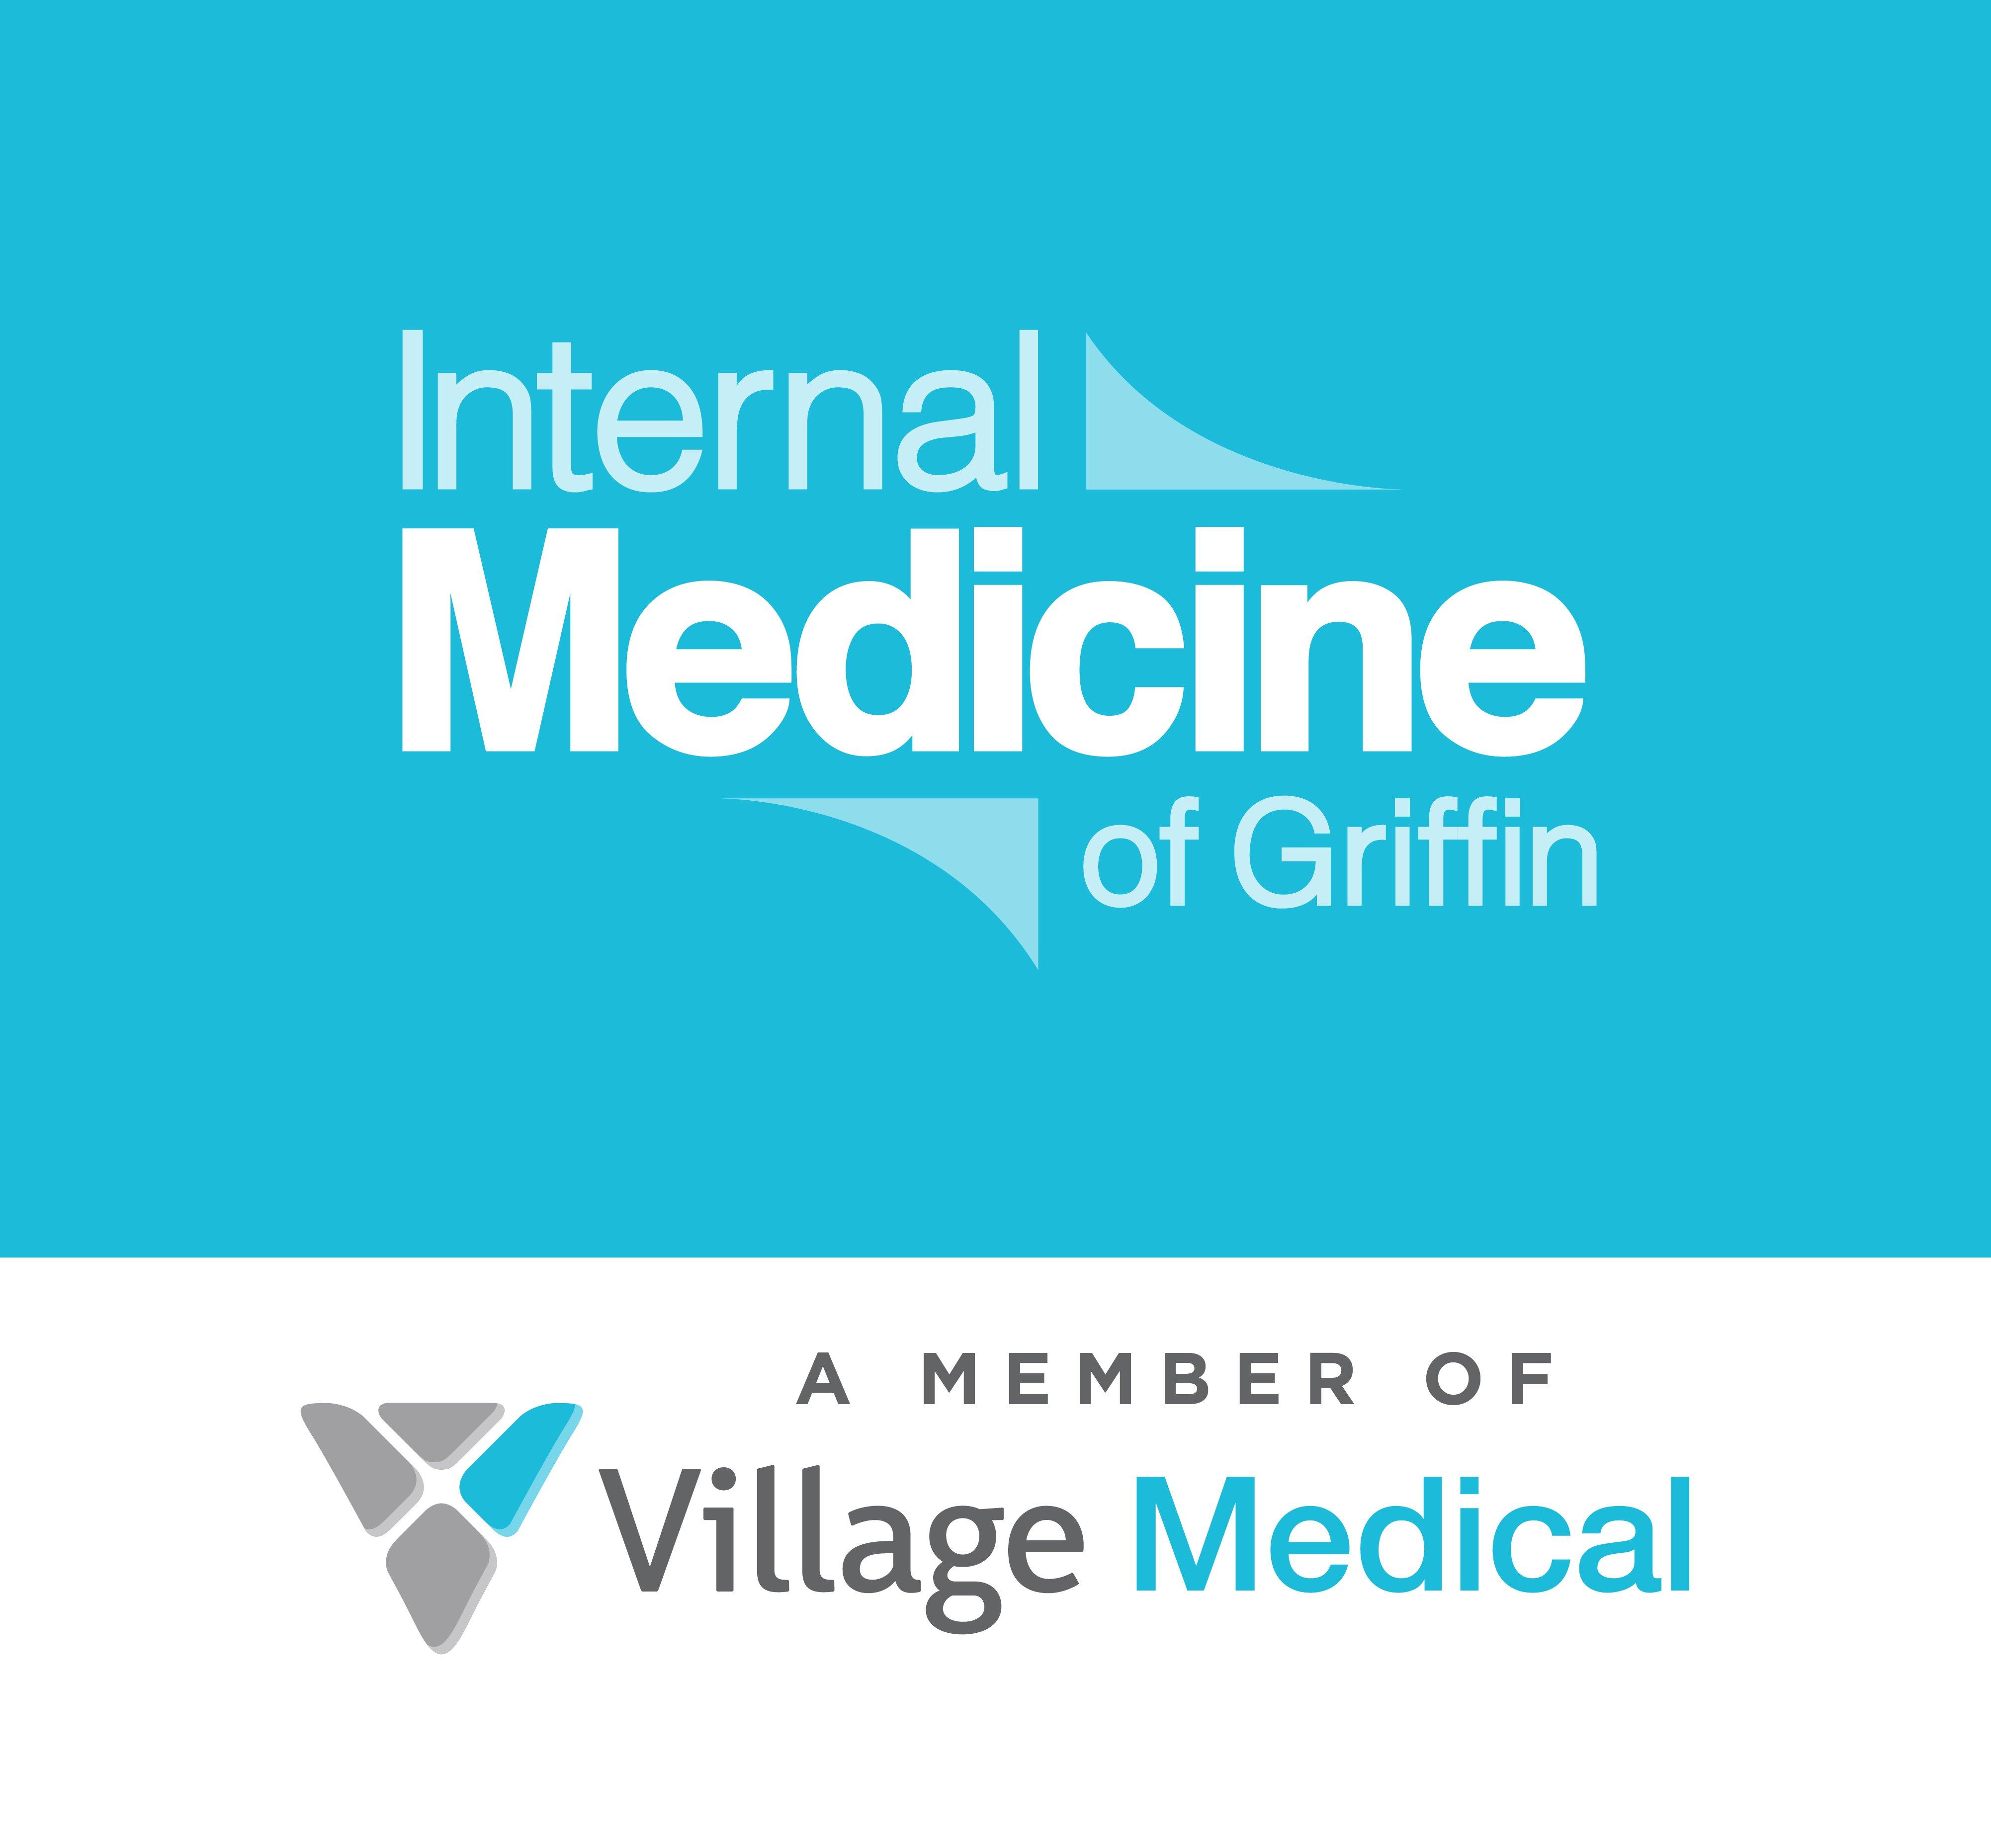 Village Medical at Internal Medicine of Griffin - 619 S. 8th St Suite 200 Griffin, GA 30224